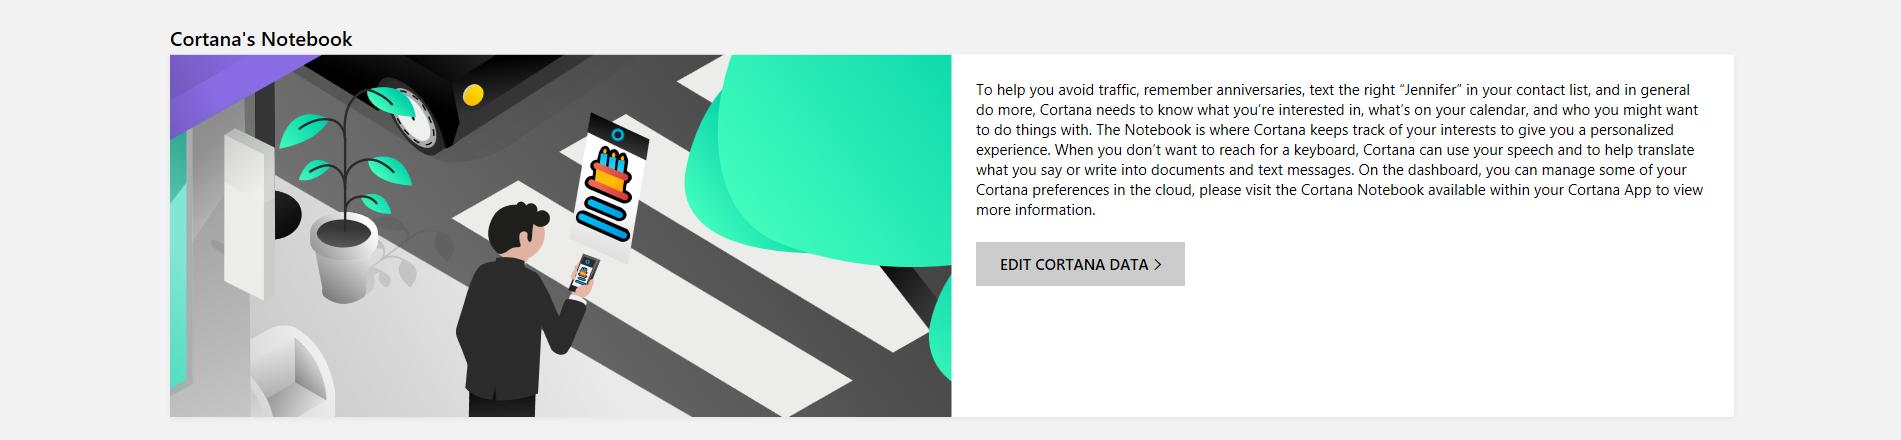 Microsoft Edge Clear History Cortana Data